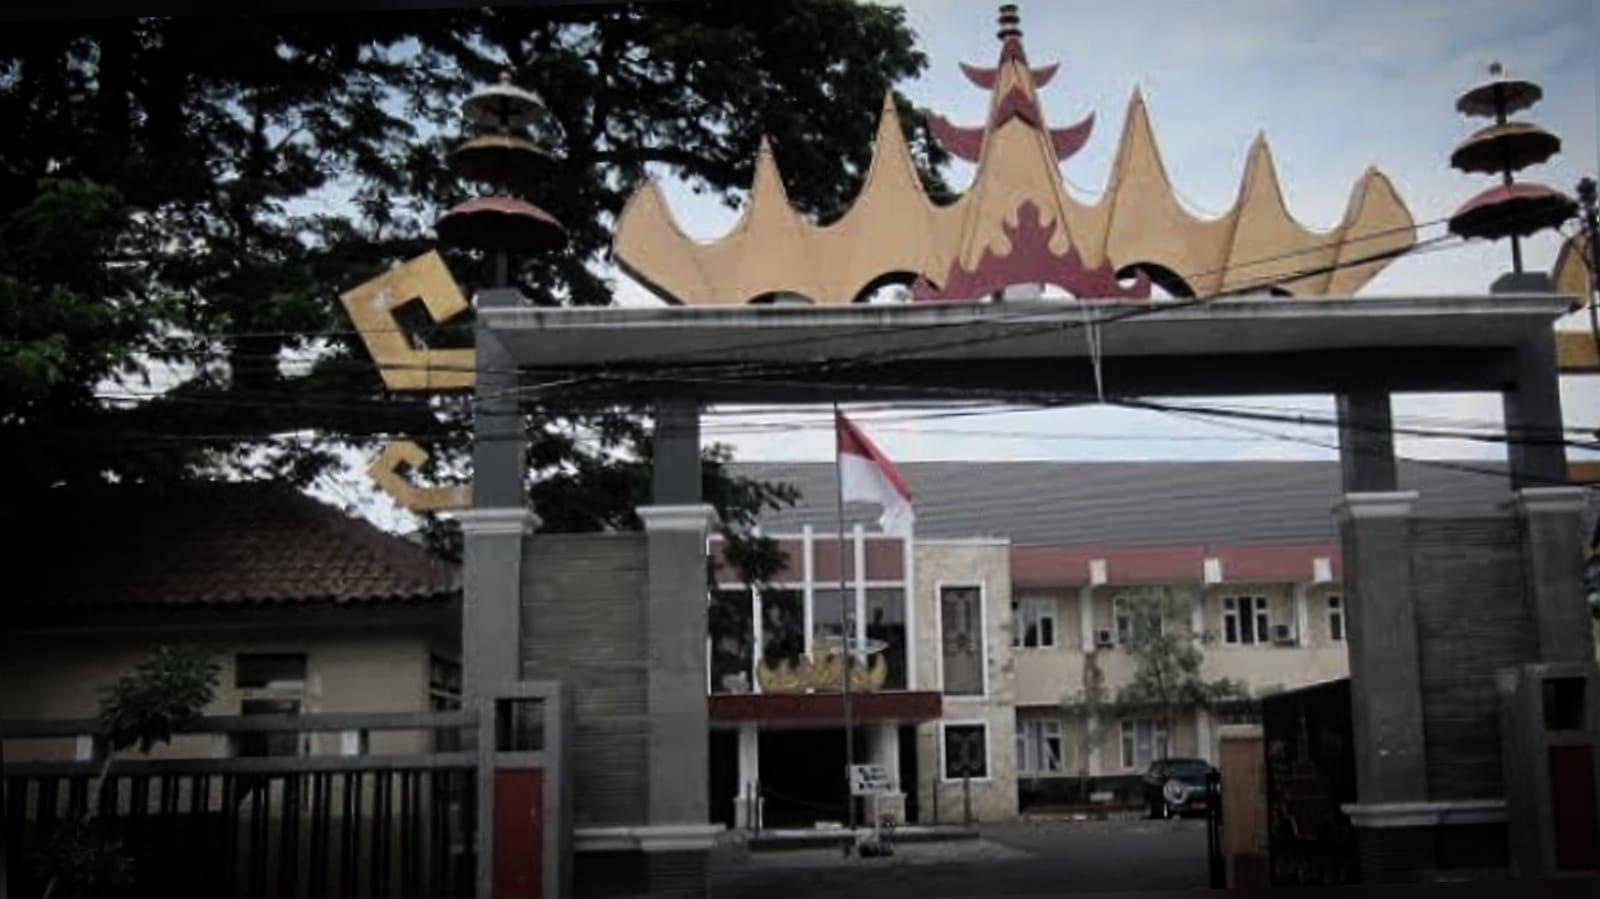 Kadis Pendidikan Lampung Digugat Rp1,15 Miliar